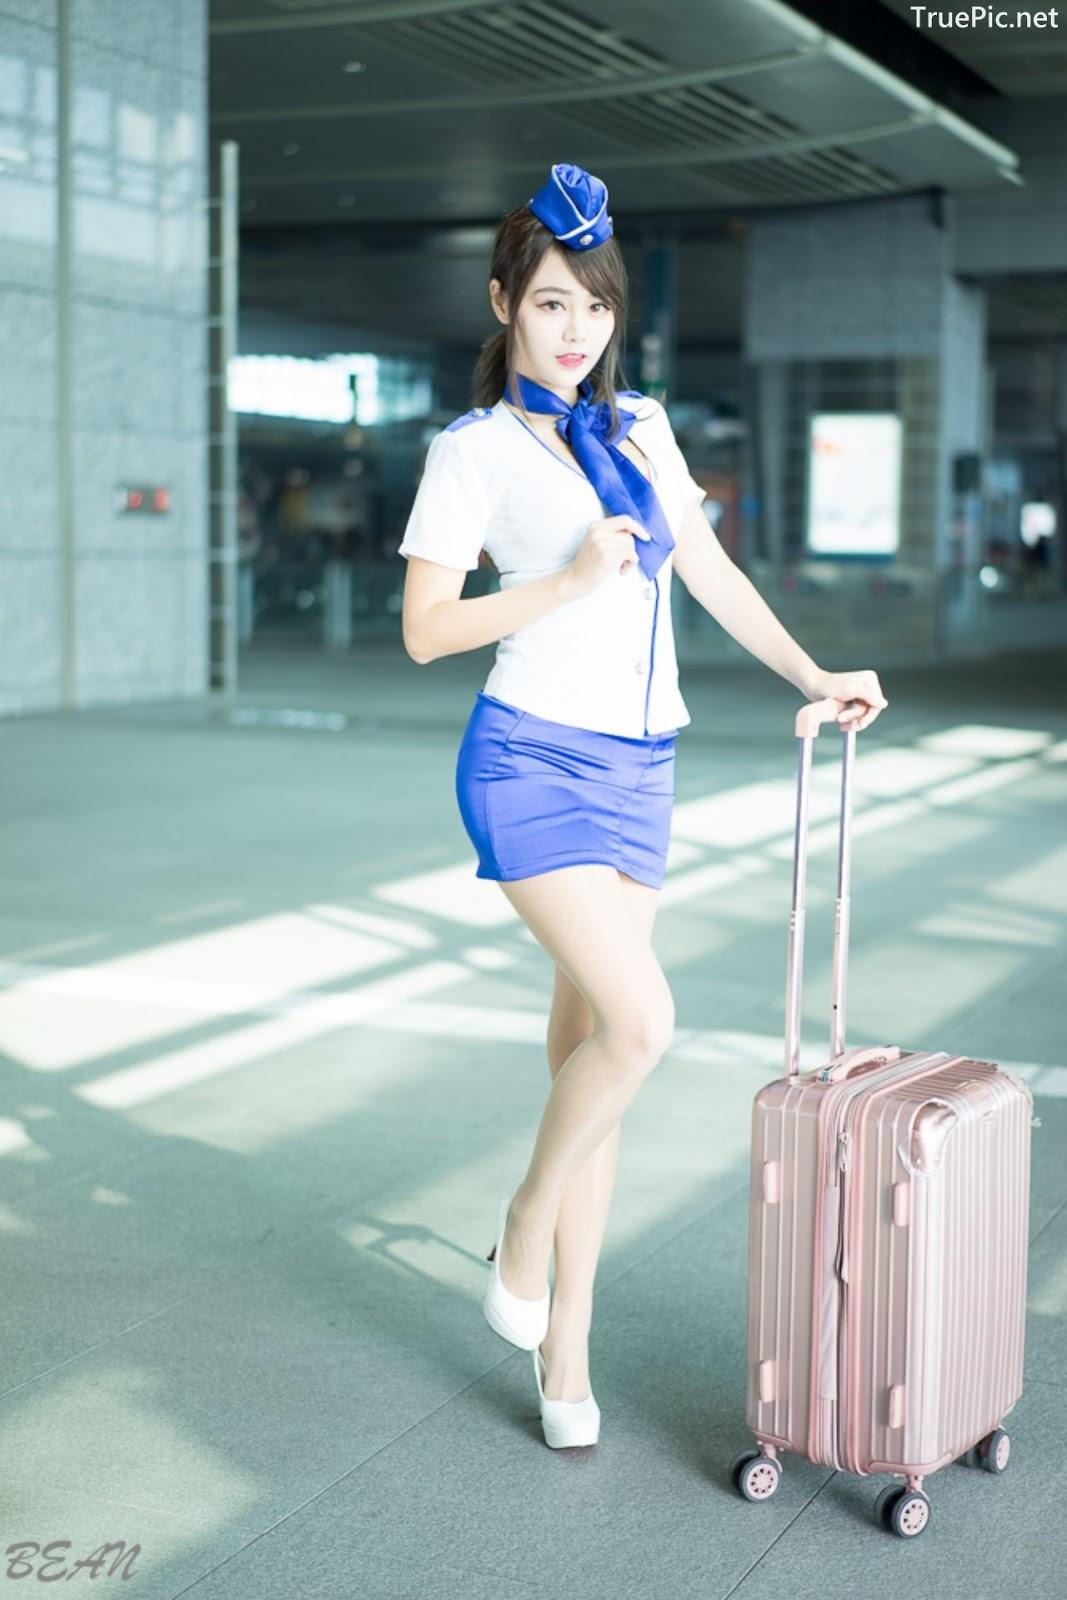 Image-Taiwan-Social-Celebrity-Sun-Hui-Tong-孫卉彤-Stewardess-High-speed-Railway-TruePic.net- Picture-9